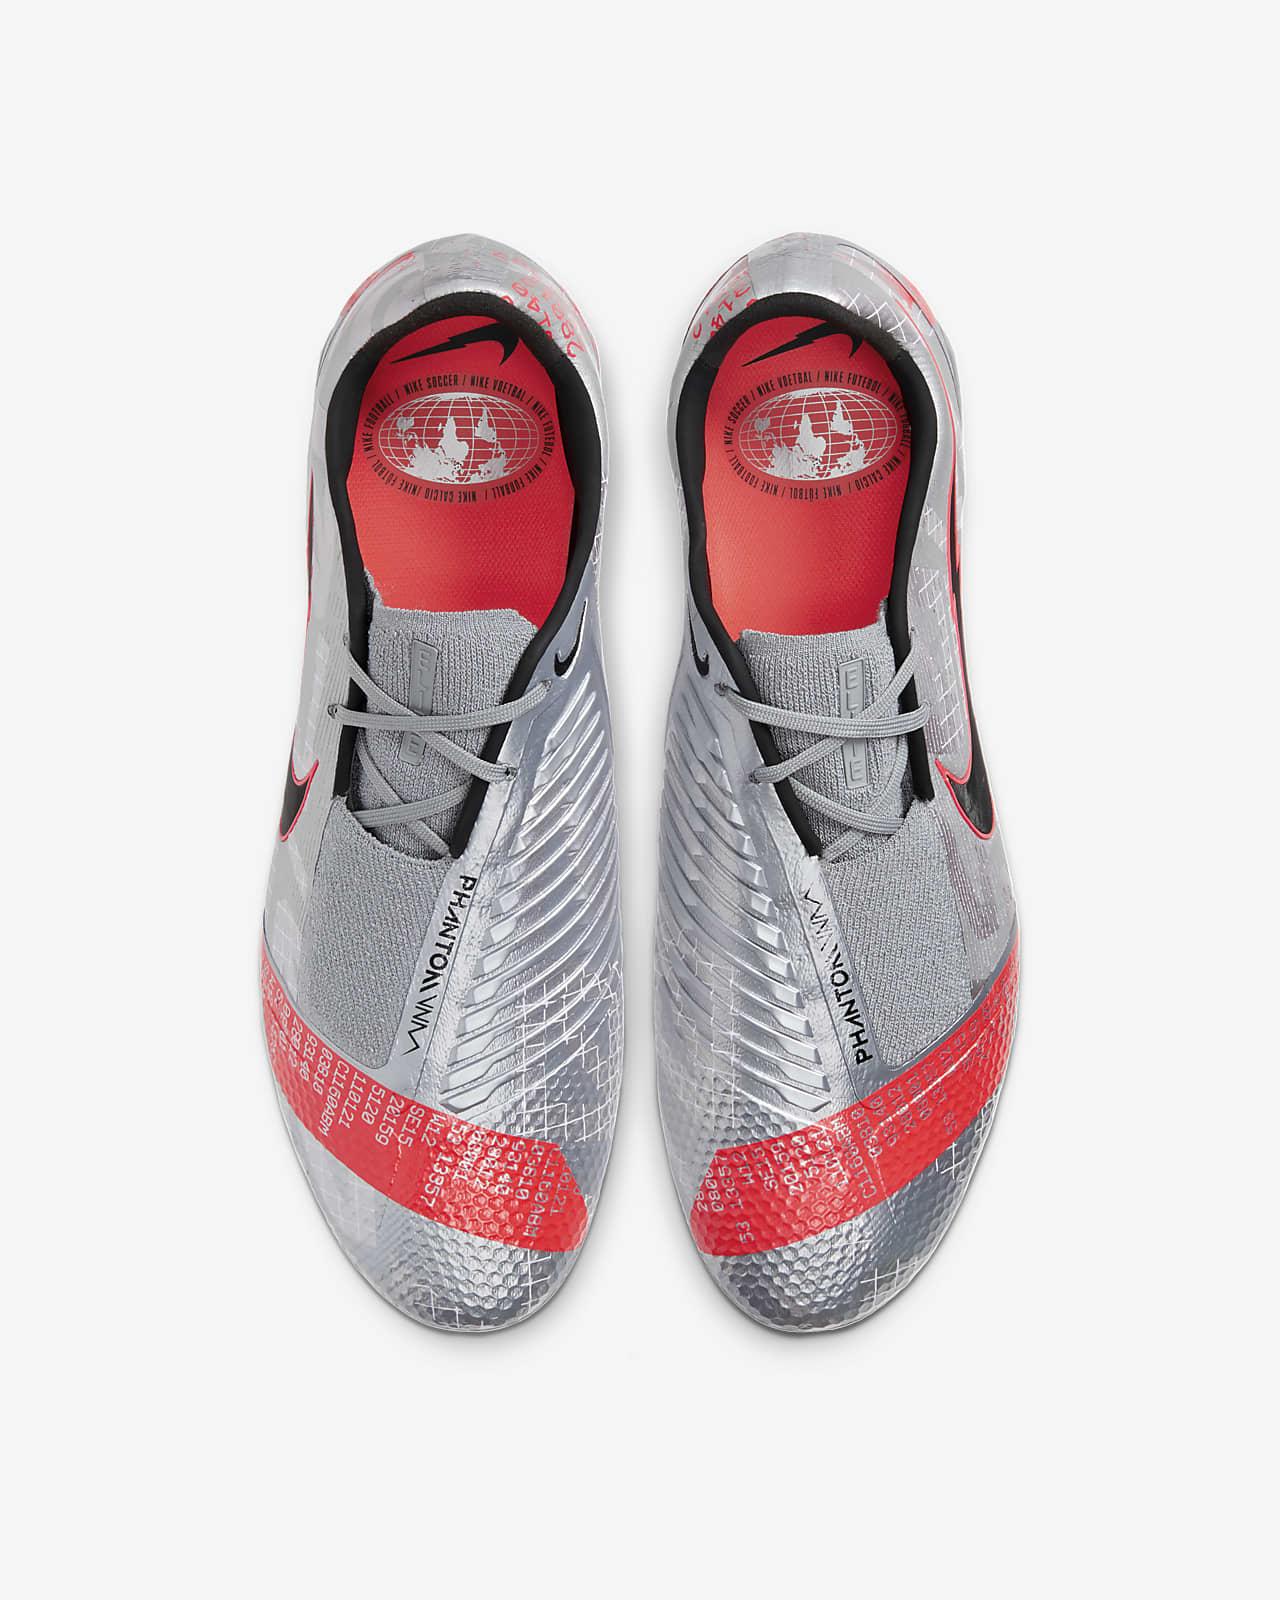 trapo factible oficina postal  Calzado de fútbol para terreno firme Nike Phantom Venom Elite FG. Nike MX